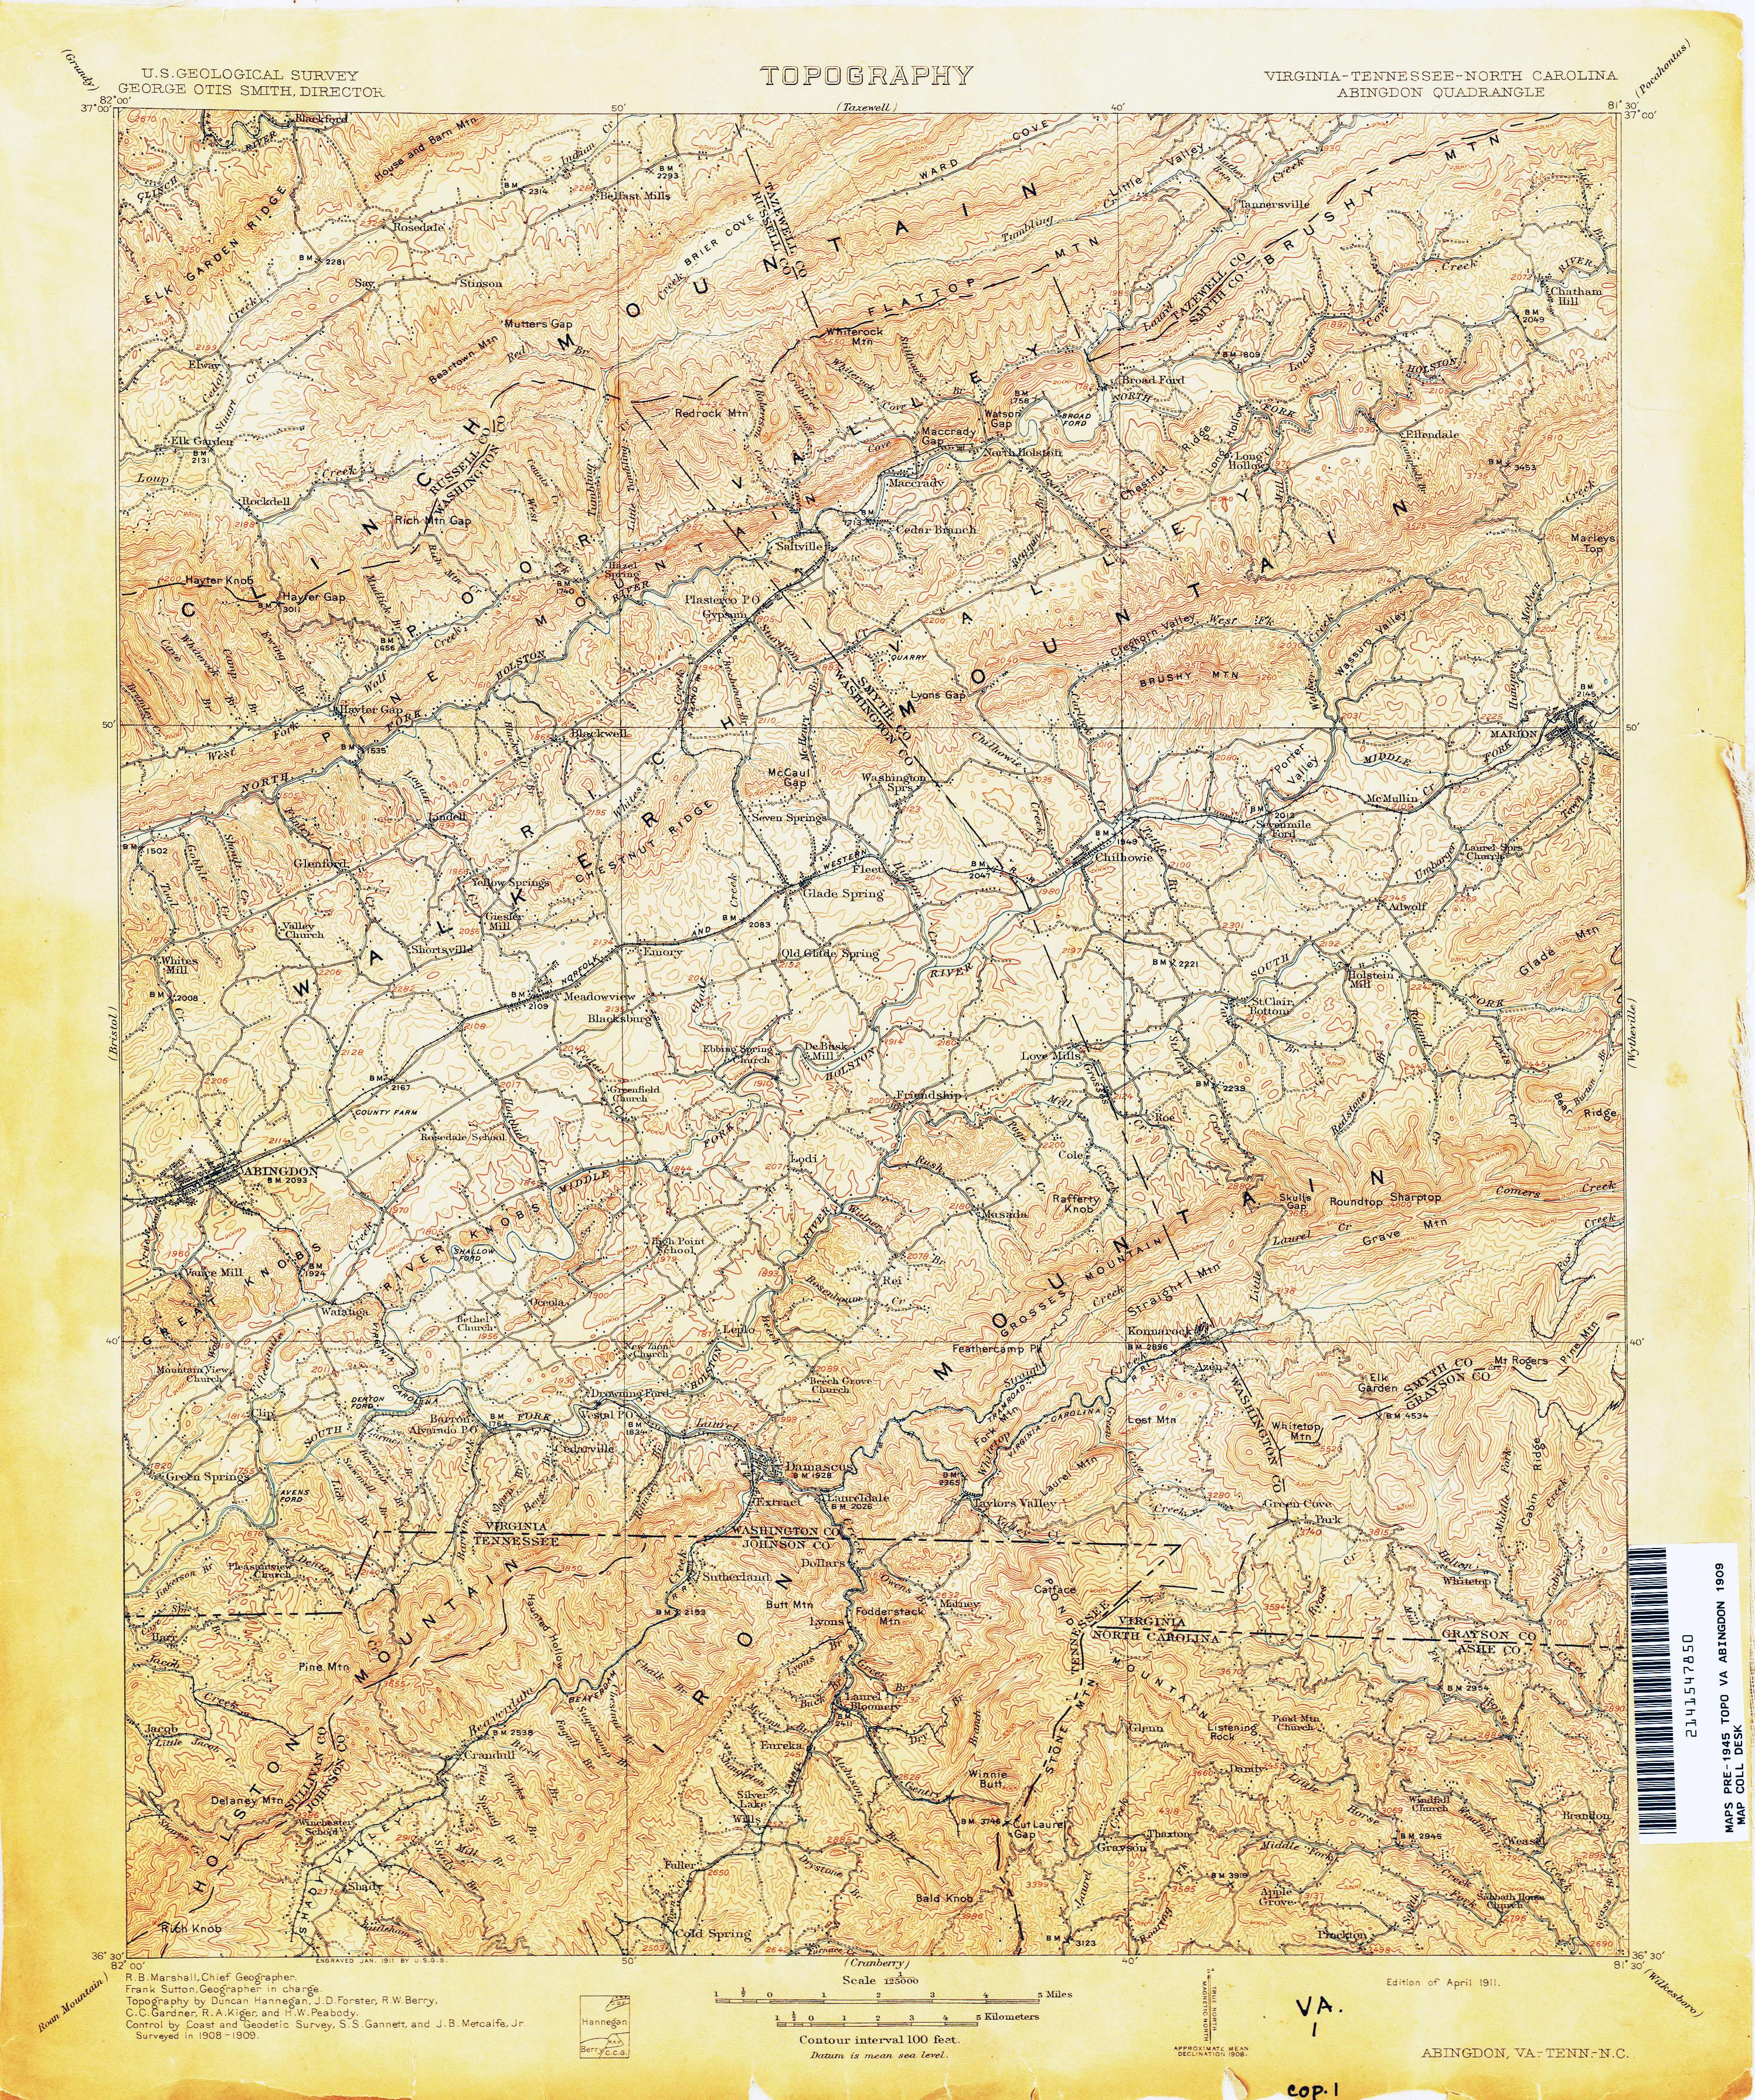 Abingdon Virginia Map.Virginia Historical Topographic Maps Perry Castaneda Map